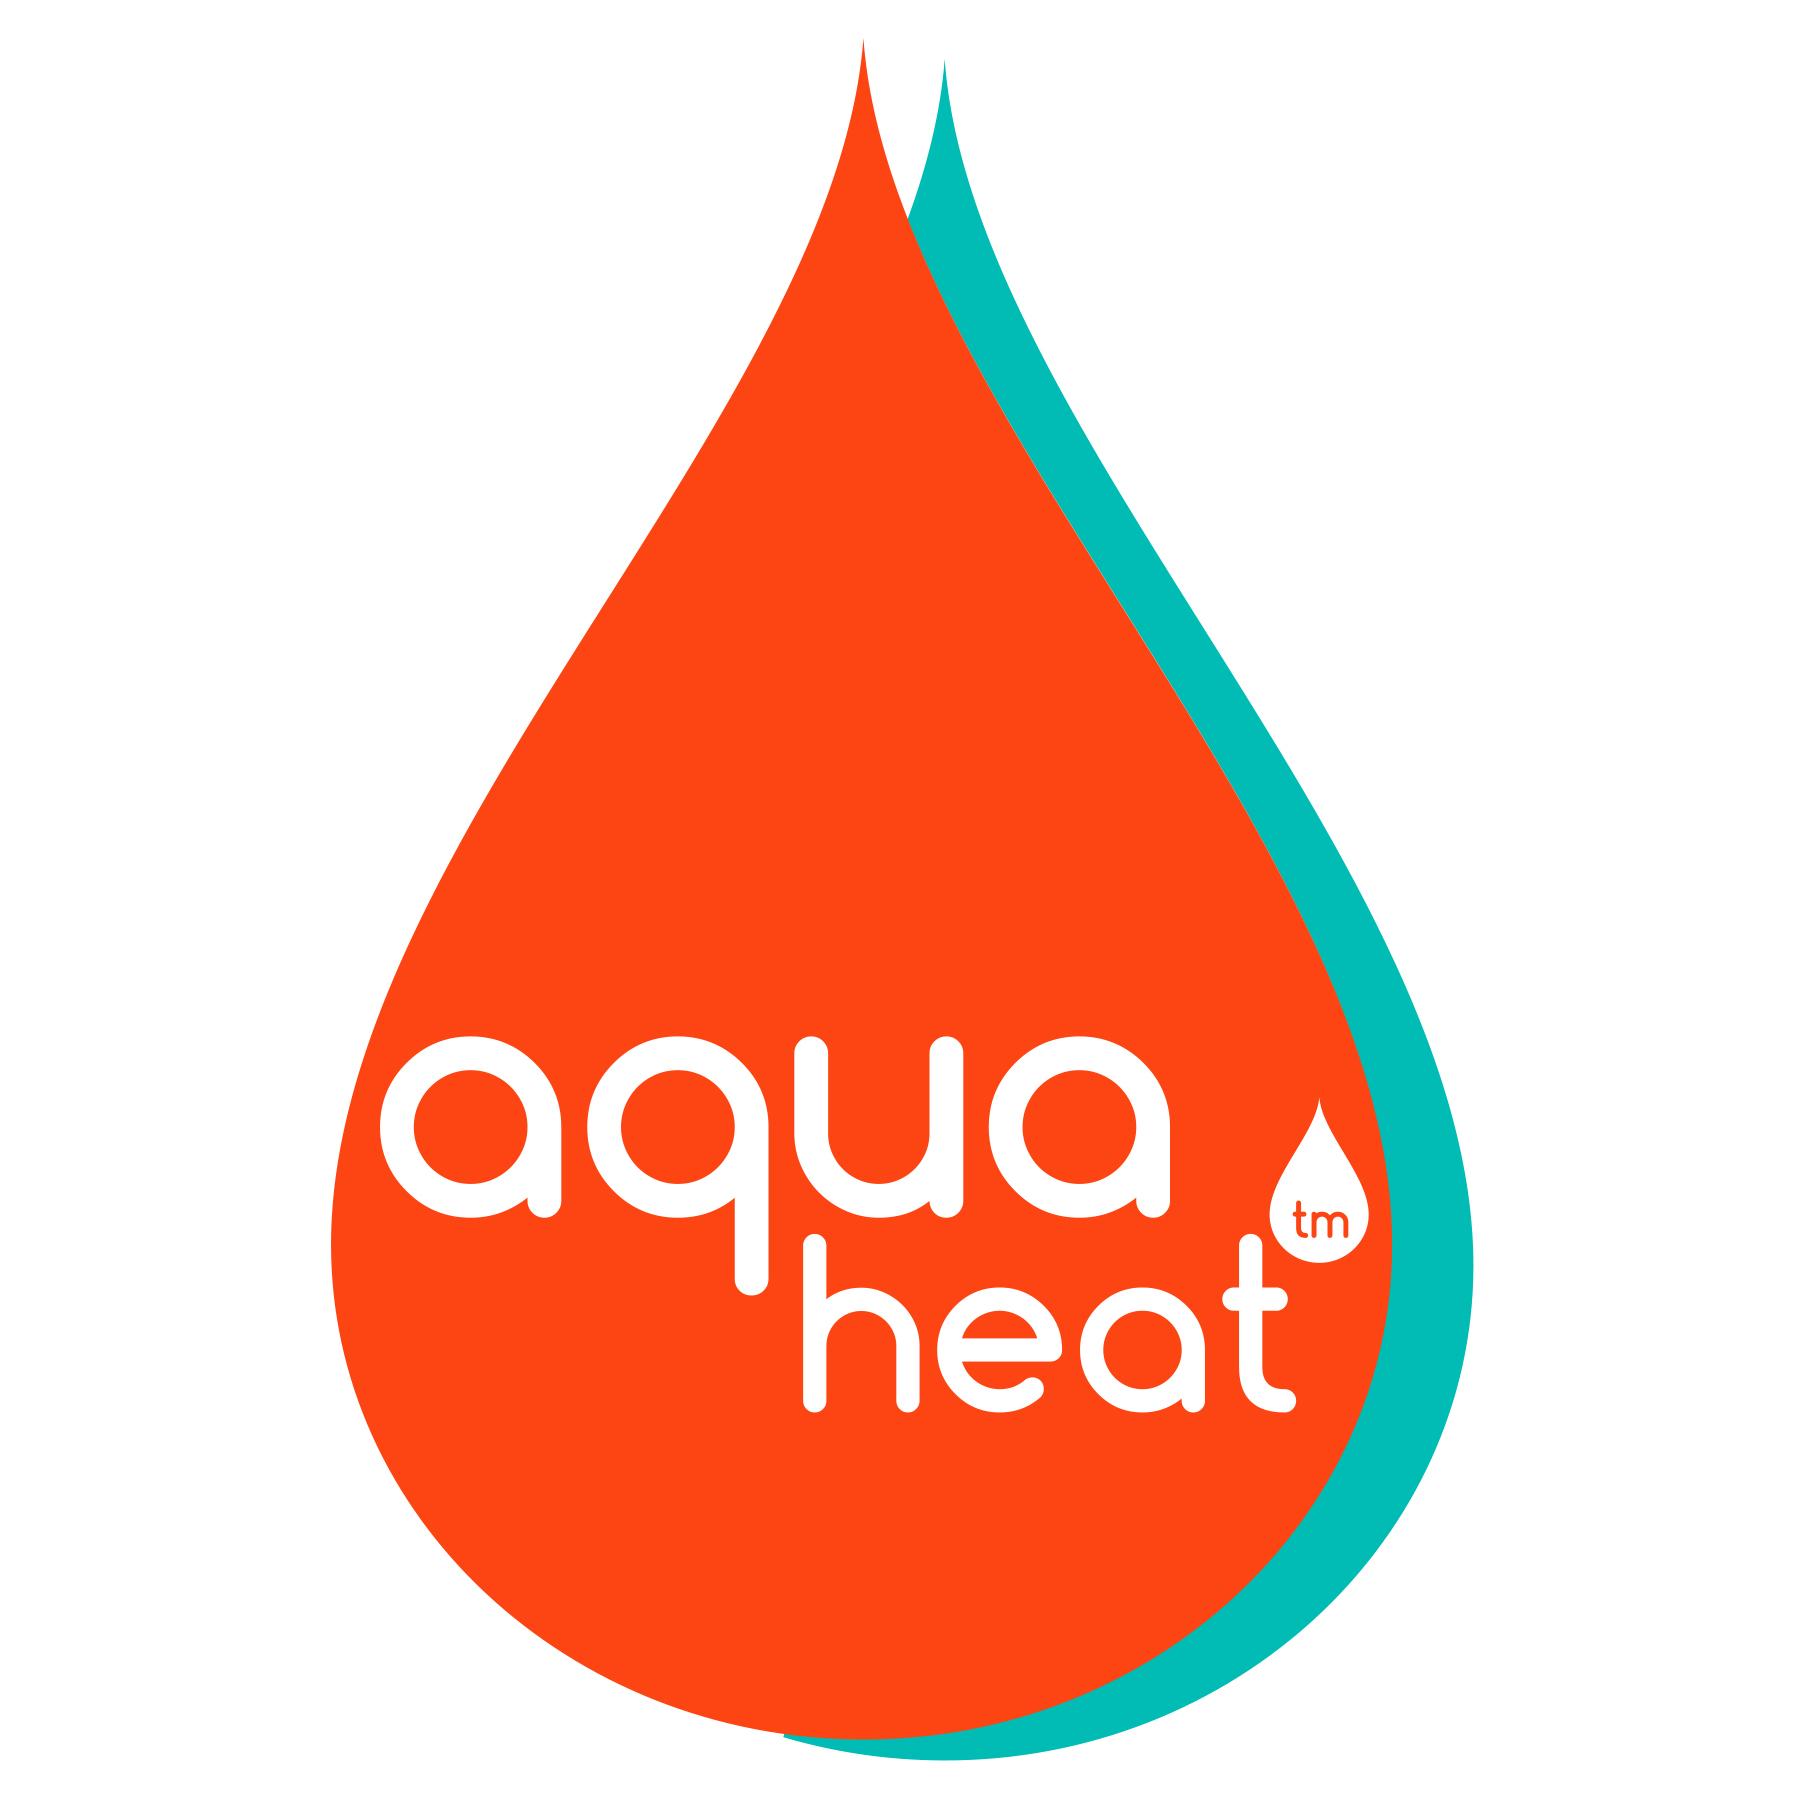 aquaheat-logo-tm.jpg